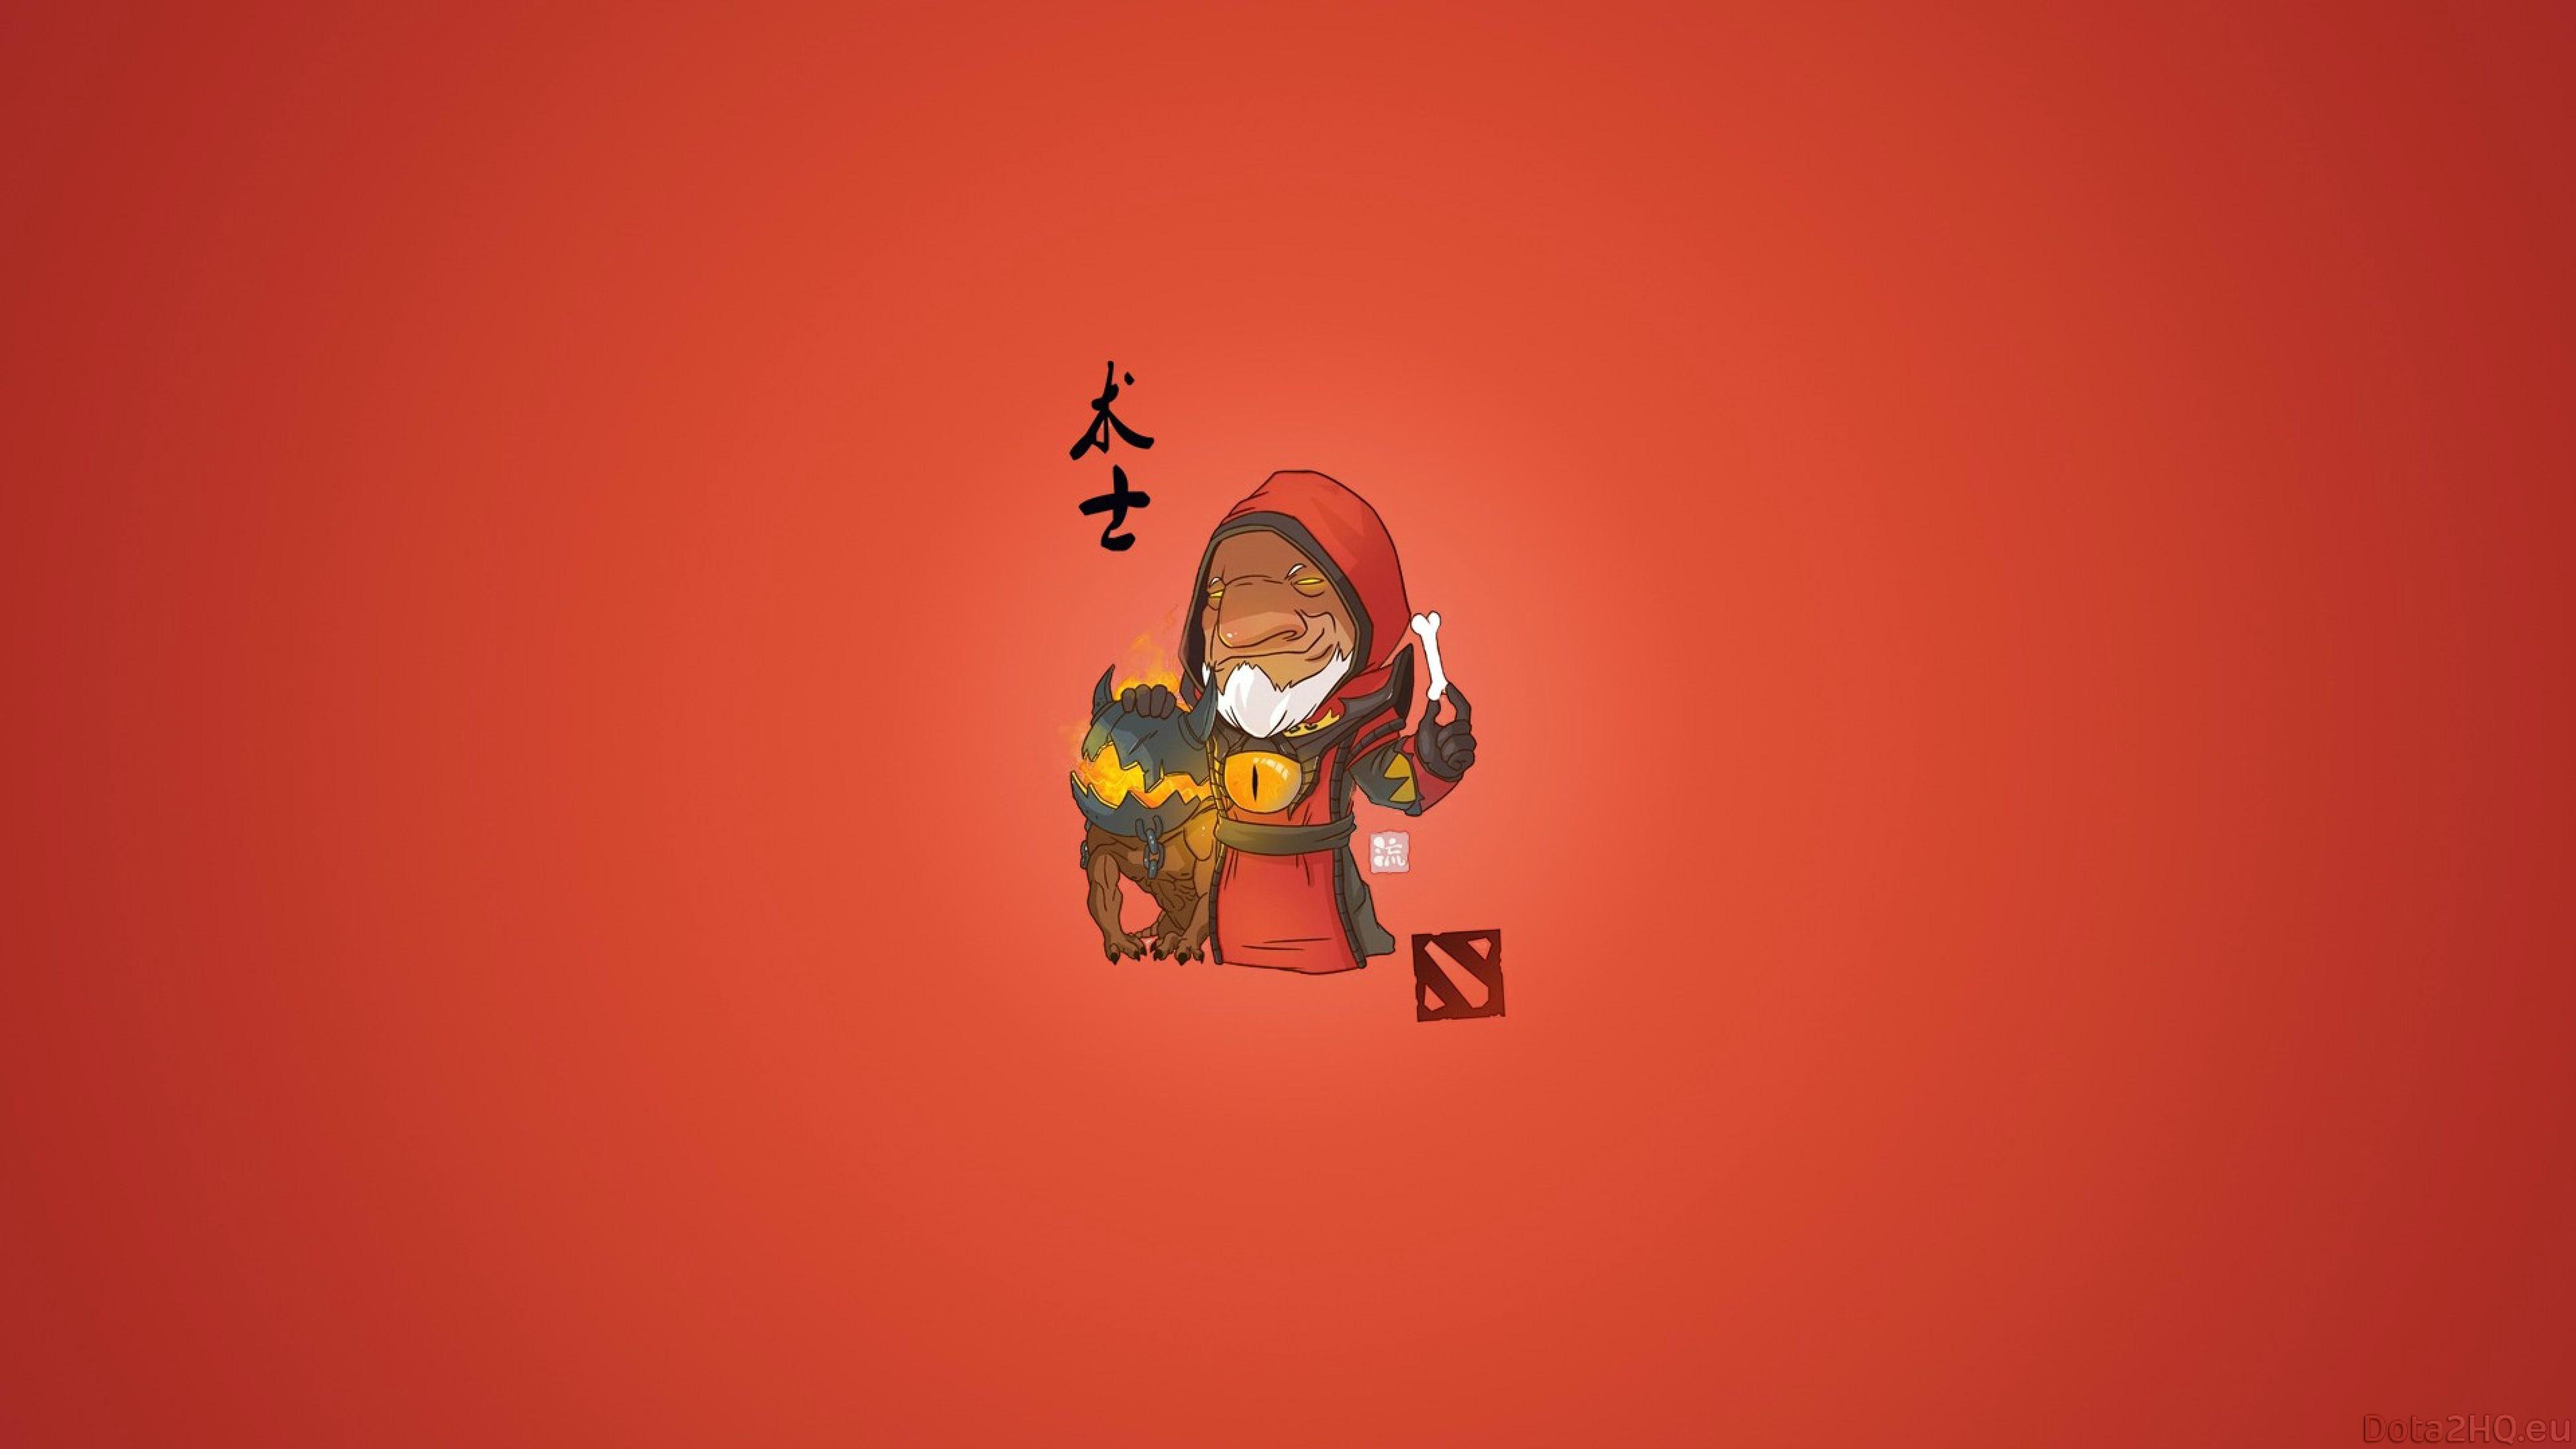 Dota2 : Warlock widescreen